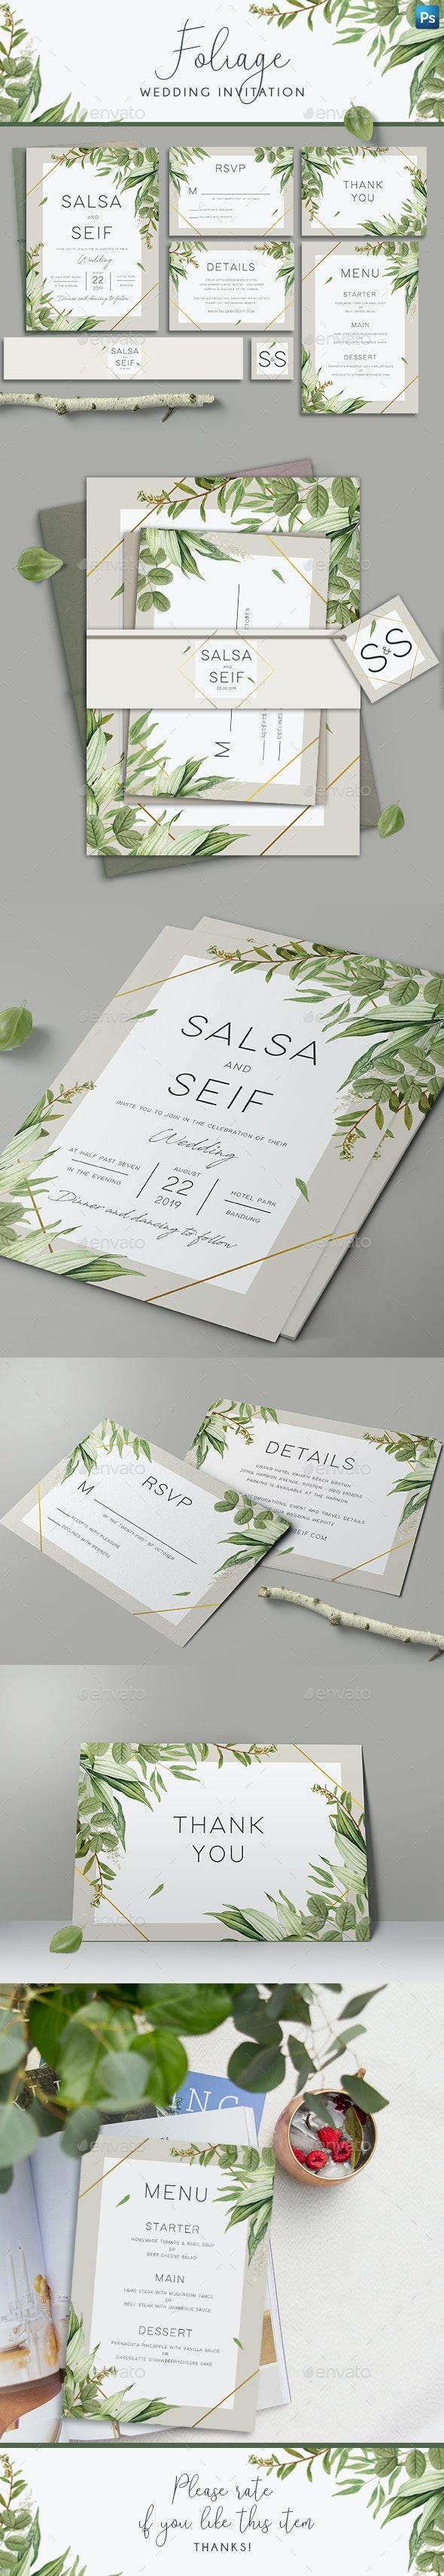 Geometric Foliage Wedding Invitation - Wedding Greeting Cards